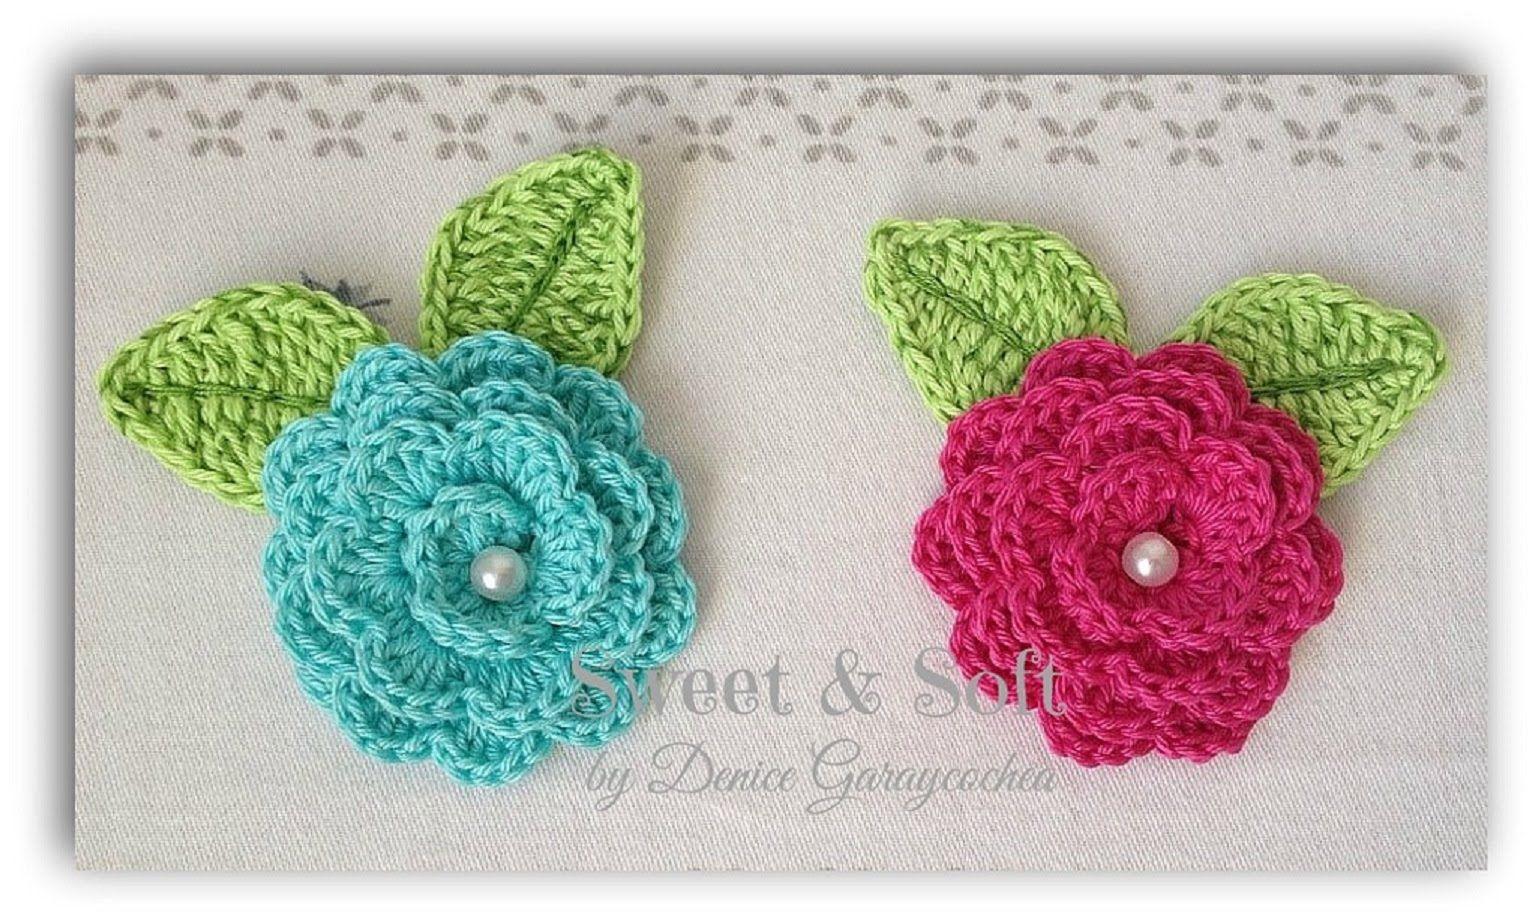 Rosas a crochet tejido flores pinterest croch y - Hacer flores de ganchillo ...